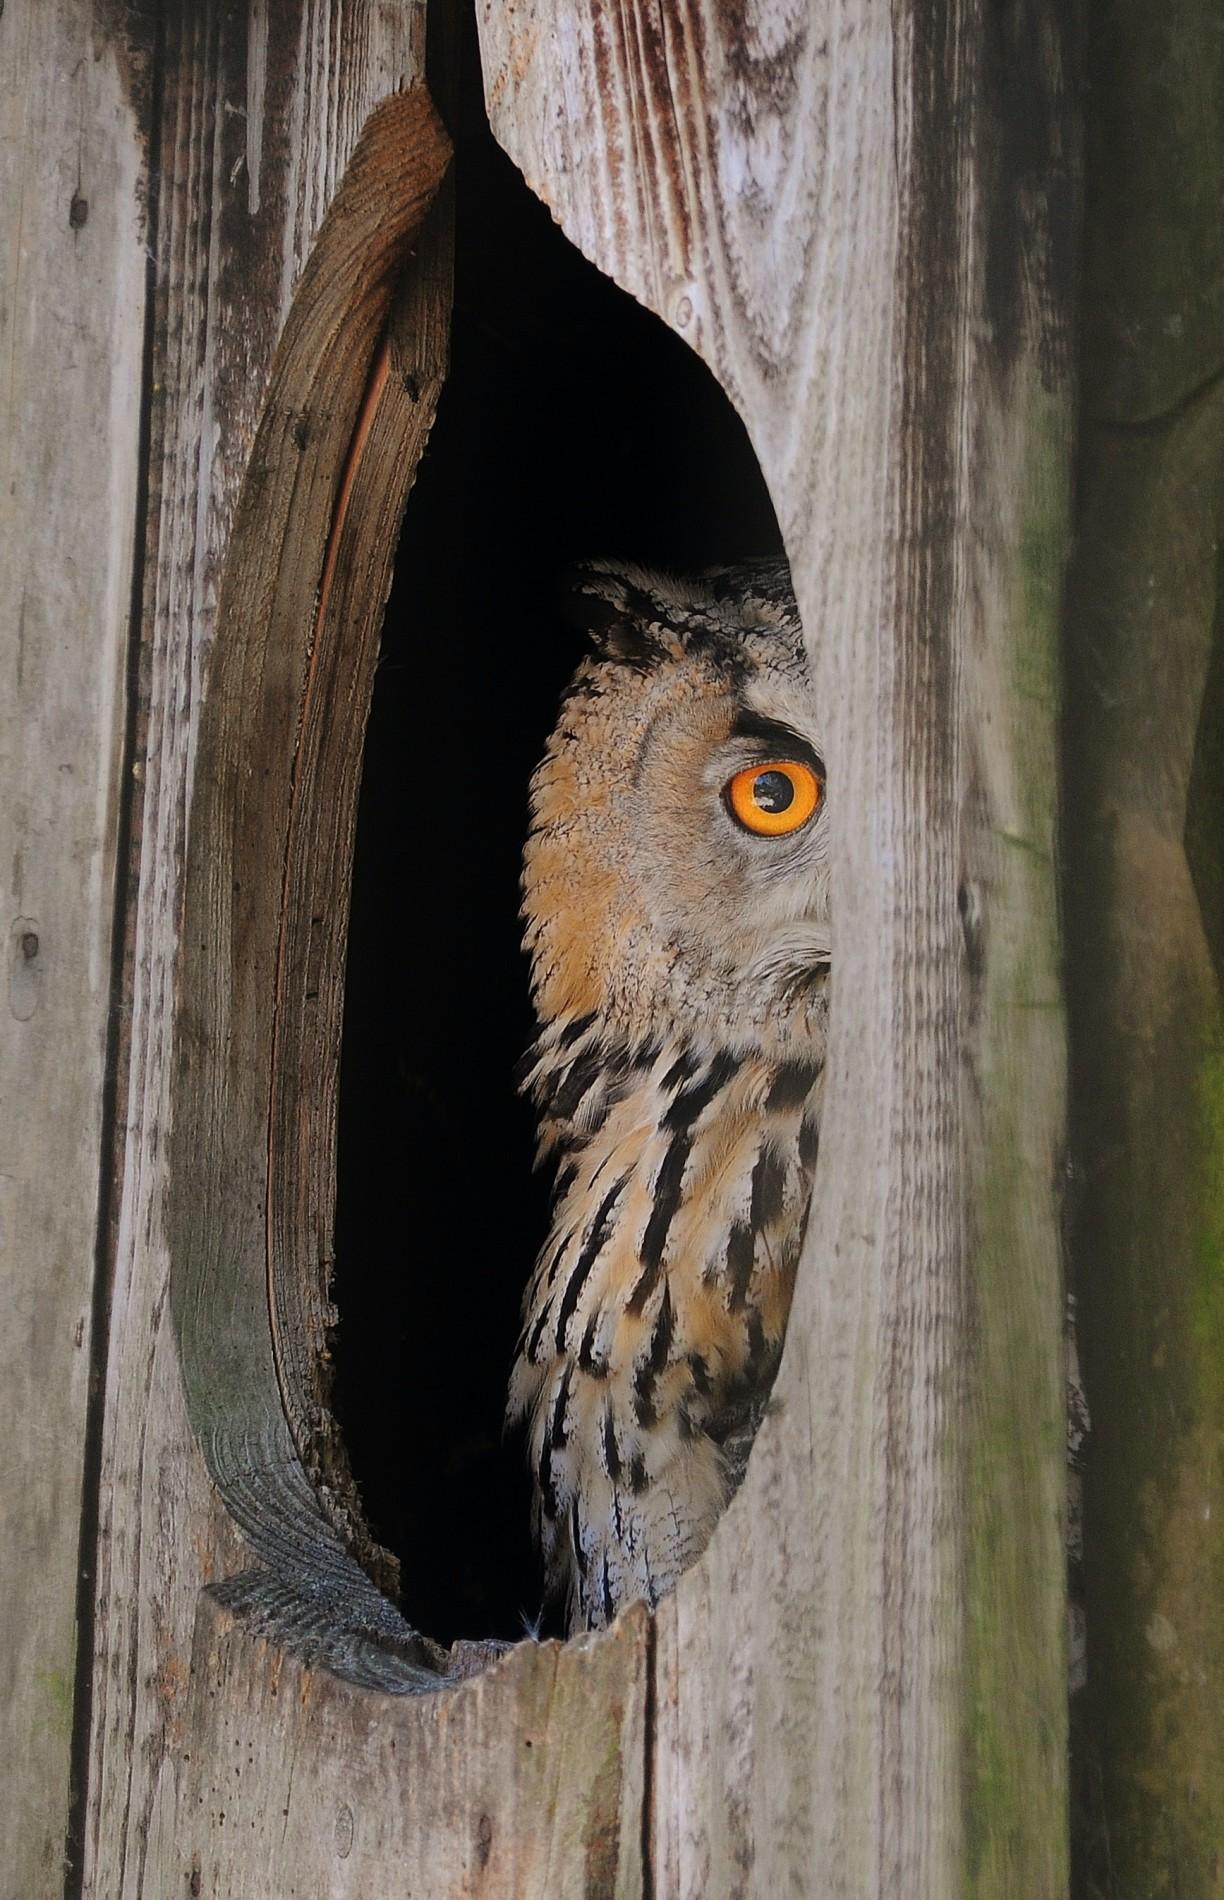 bird-animal-owl-3890